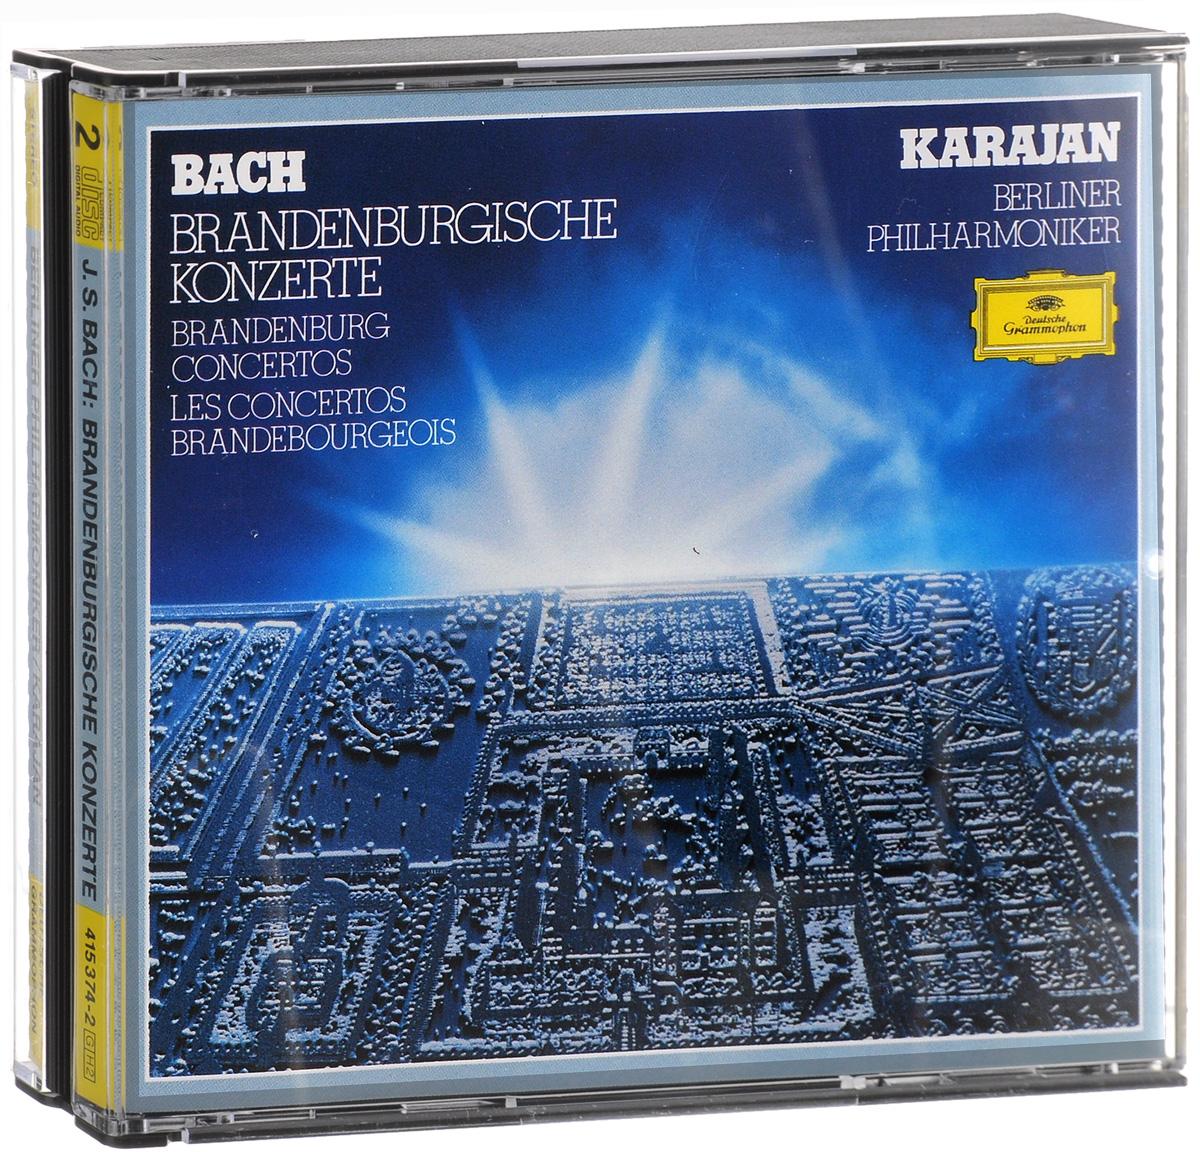 Герберт Караян,Berliner Philharmoniker Karajan. J. S. Bach. Brandenburgische Konzerte (2 CD) цены онлайн